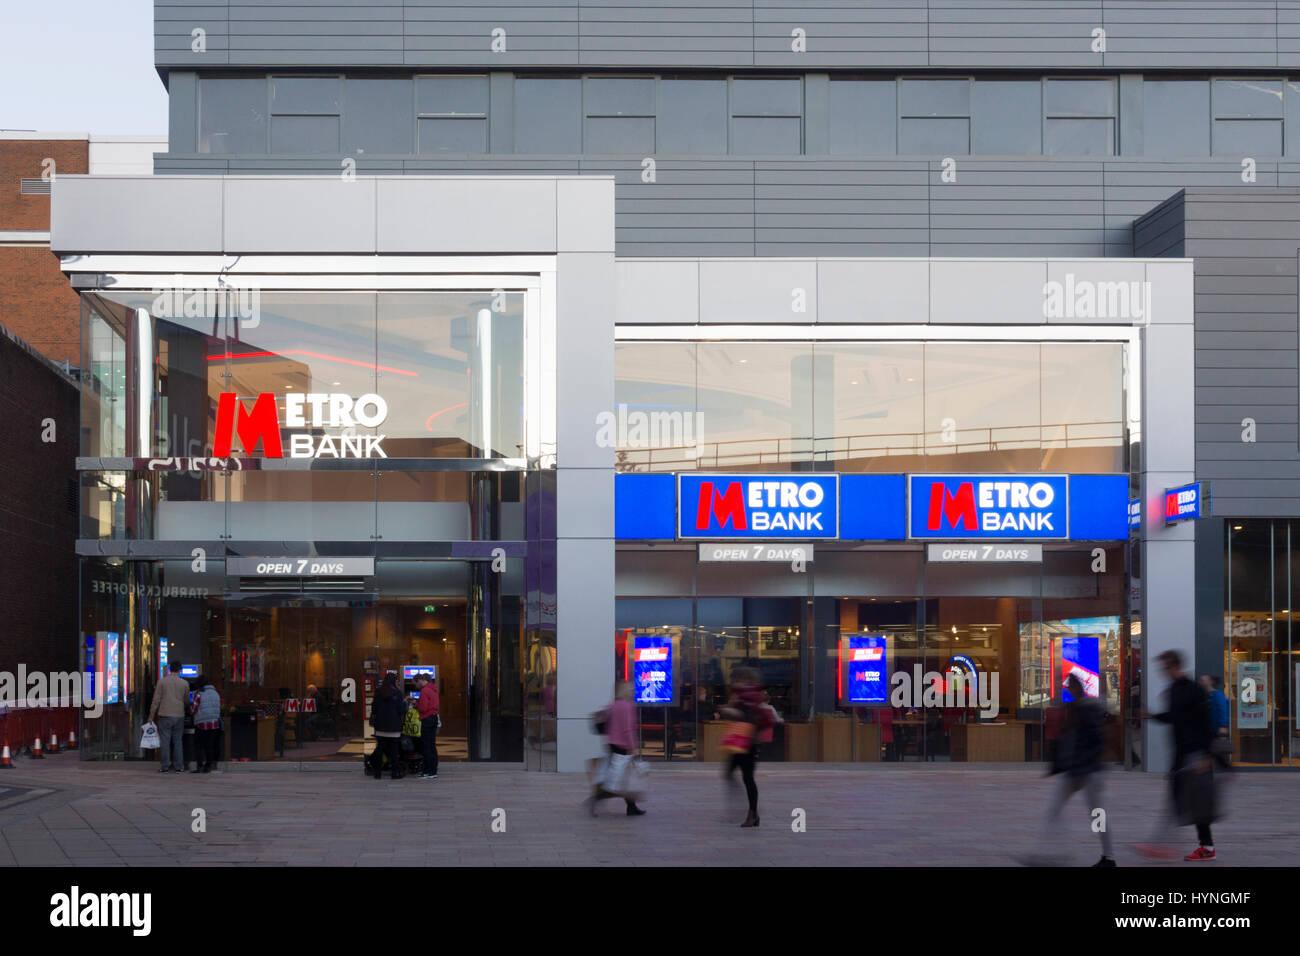 Metro Bank, Basingstoke - Stock Image